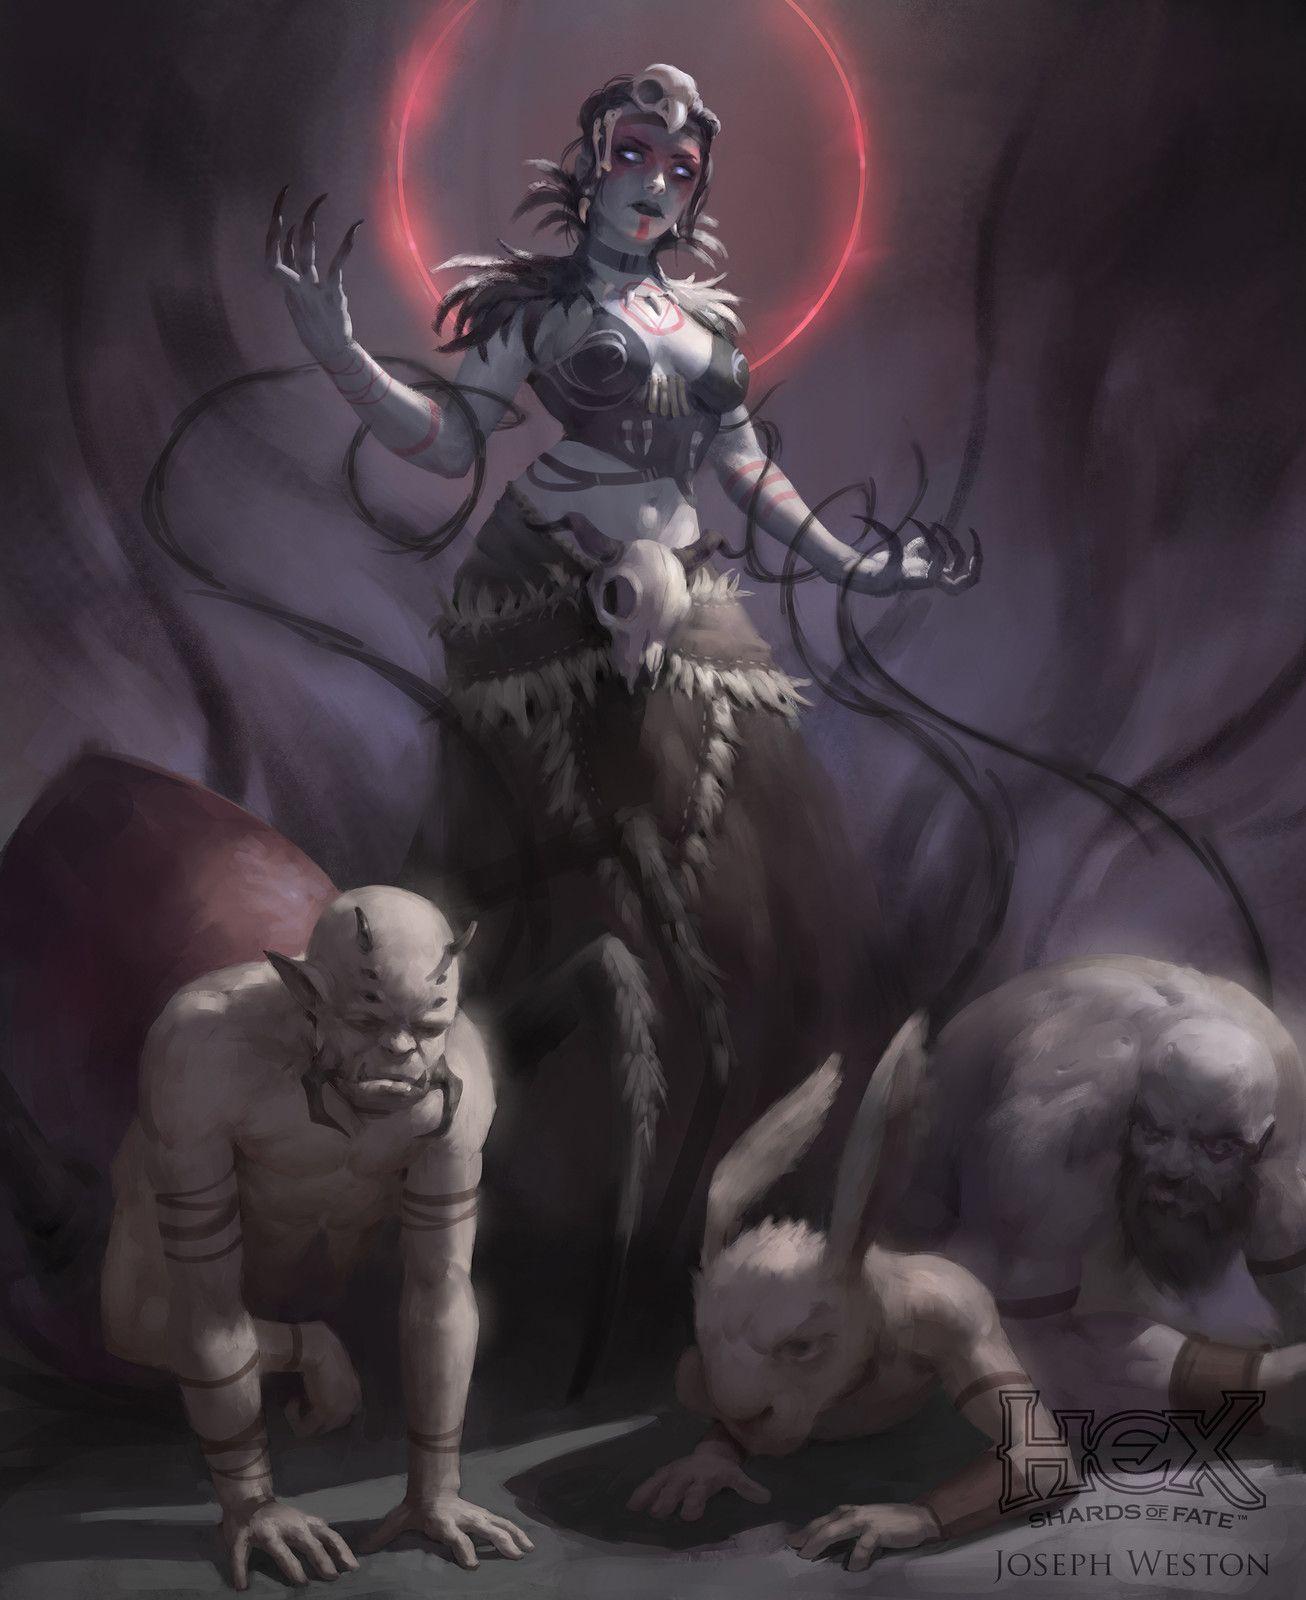 Mistress of Bones, Joseph Weston on ArtStation at https://www.artstation.com/artwork/VaYNP